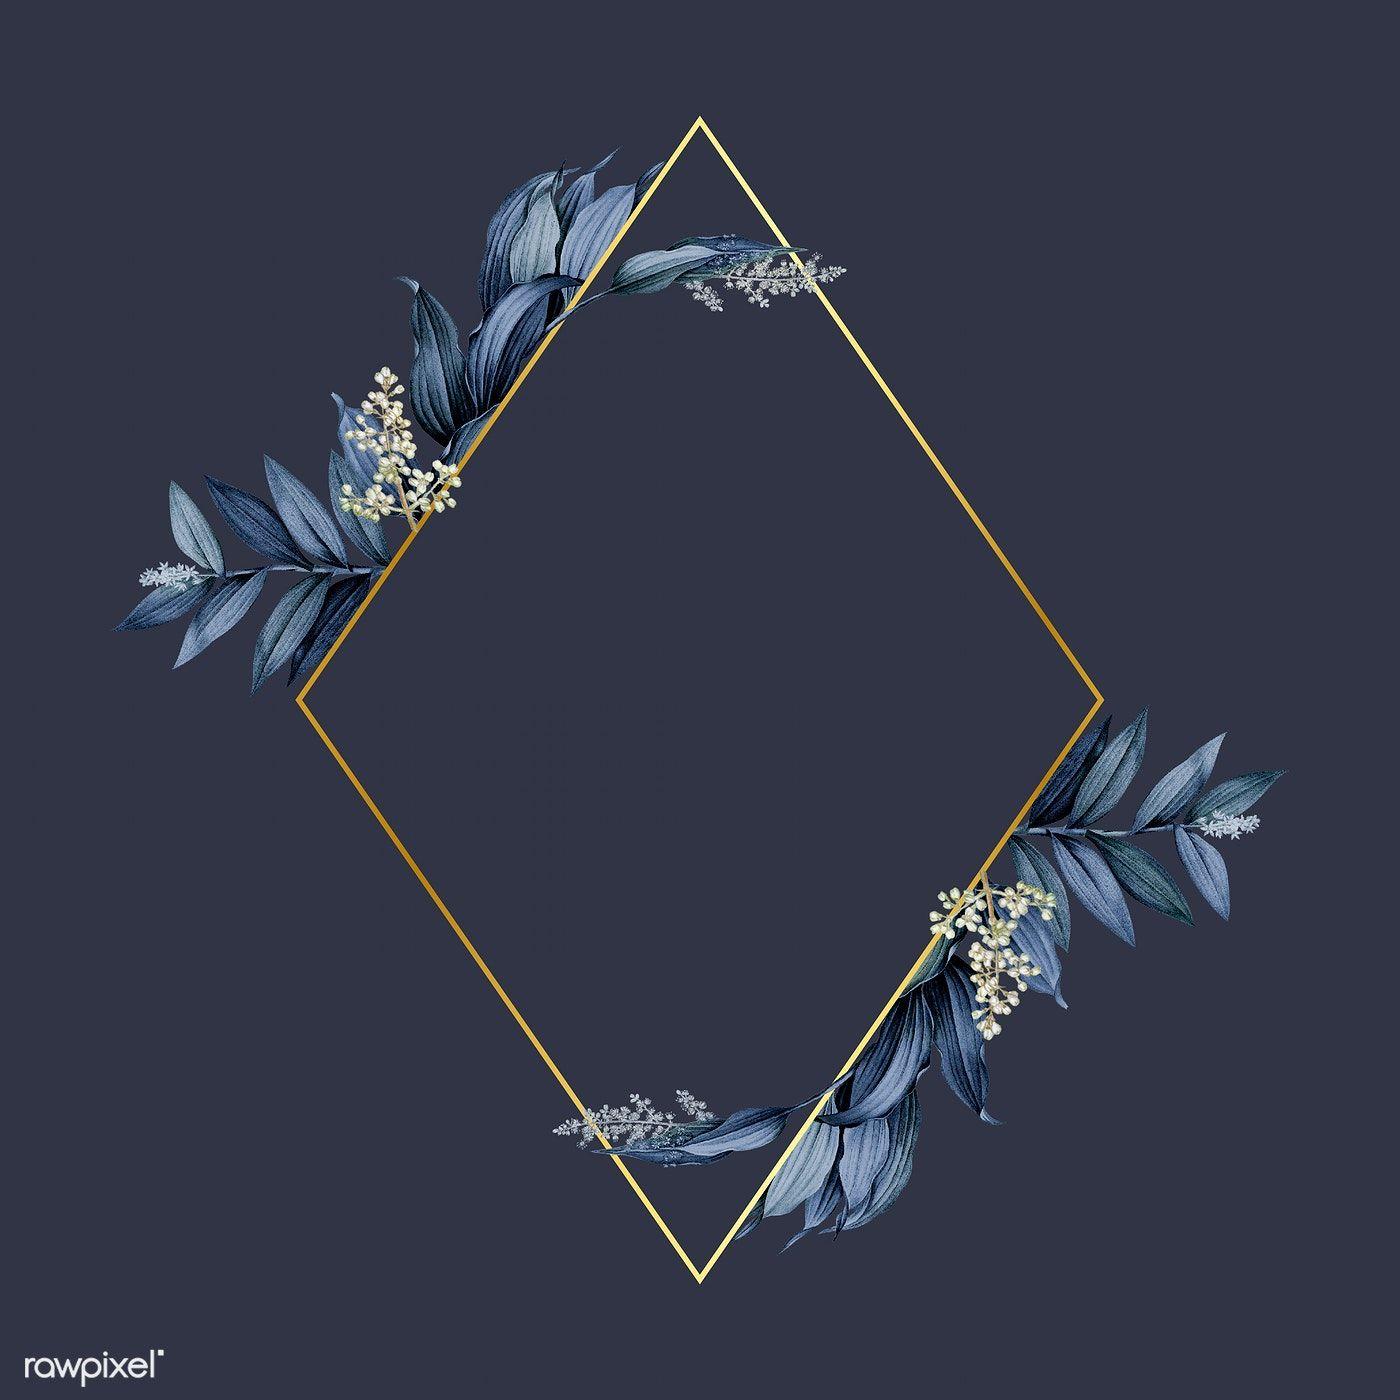 Aesthetic Navy Blue Background